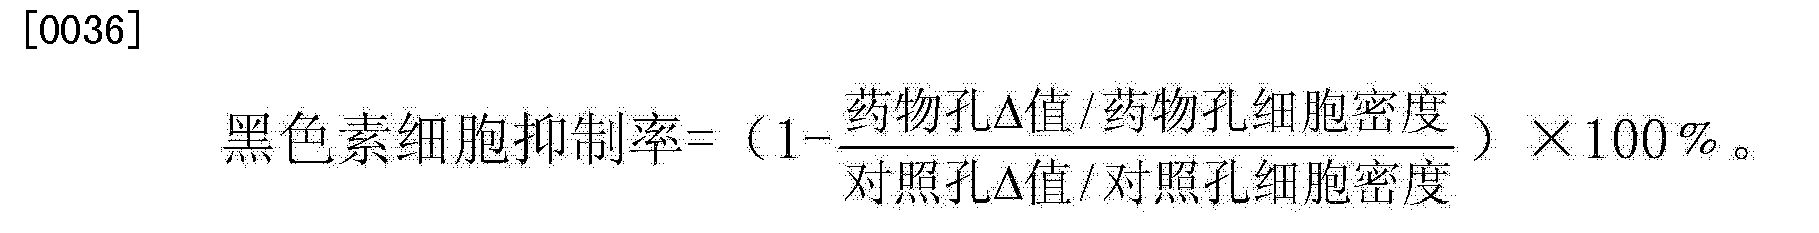 Figure CN103637952AD00101